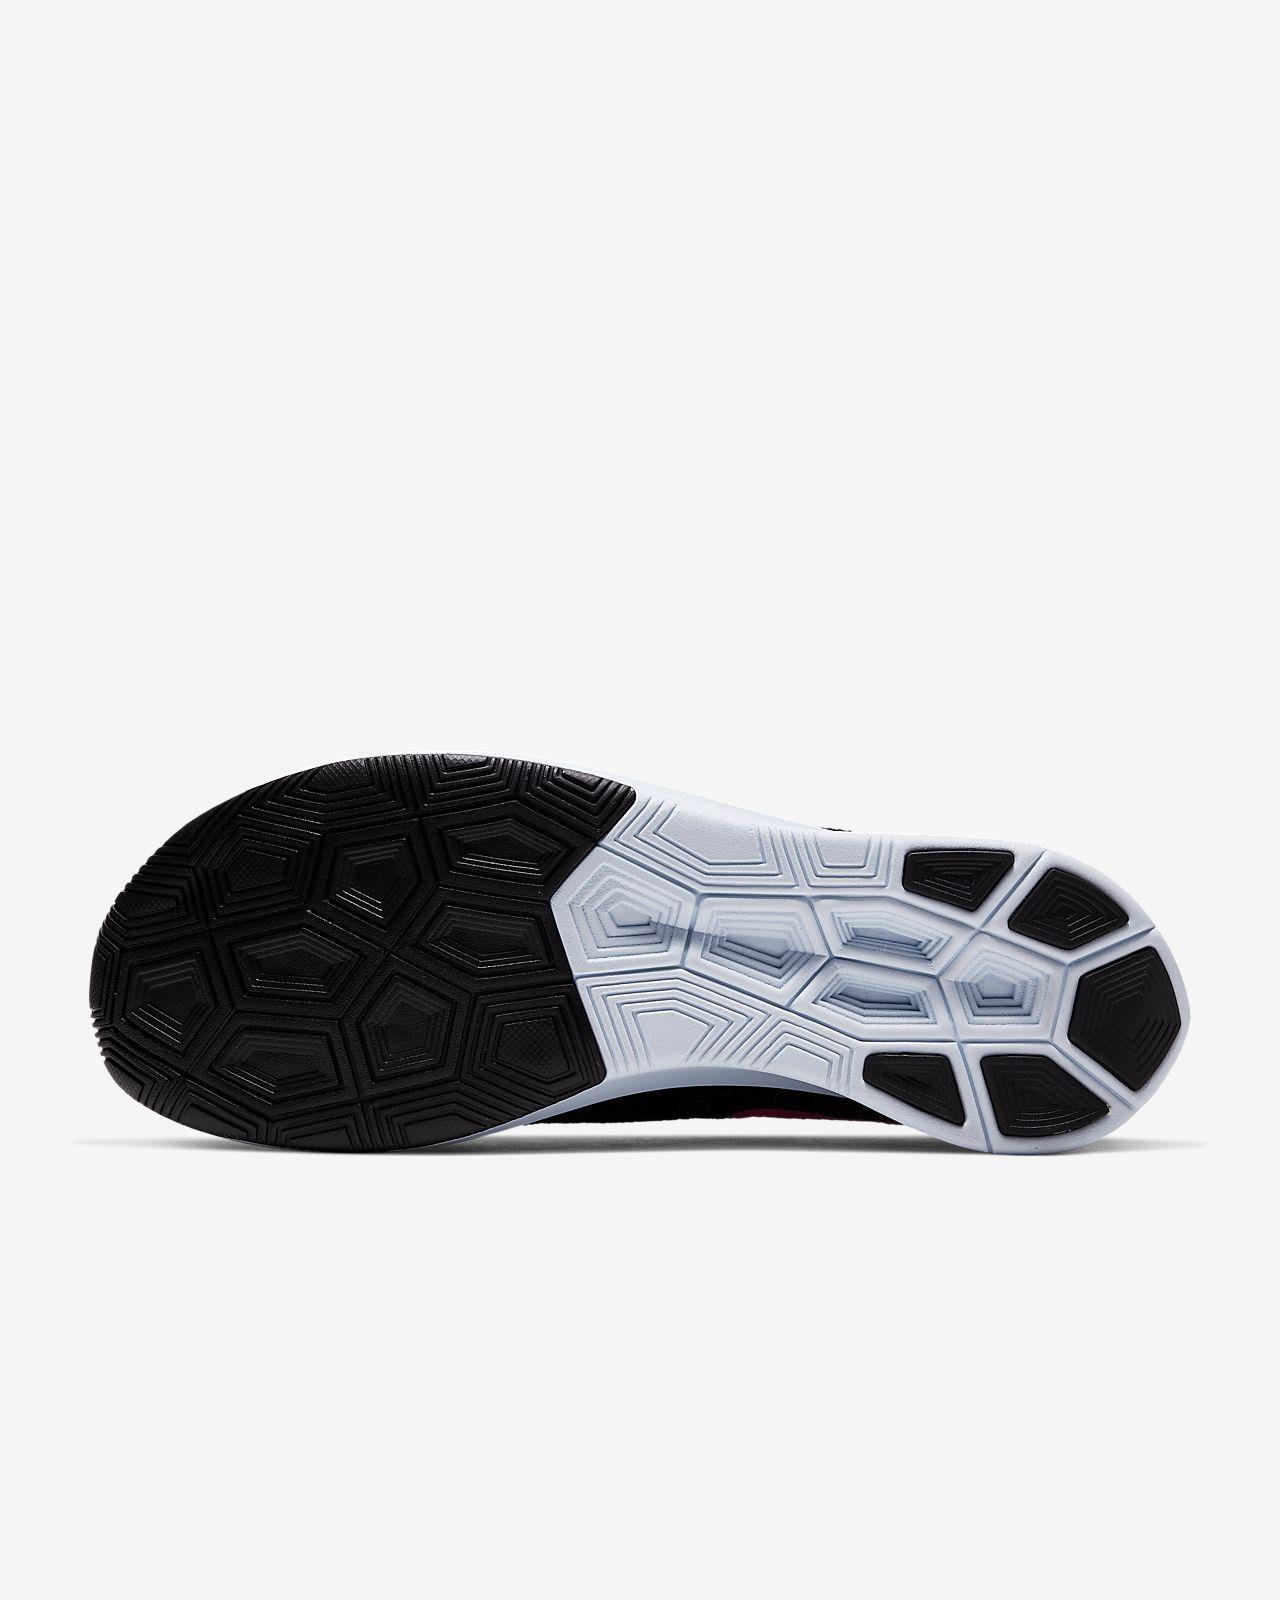 91d188e1bac65 Nike Zoom Fly Flyknit Women s Running Shoe . Nike.com